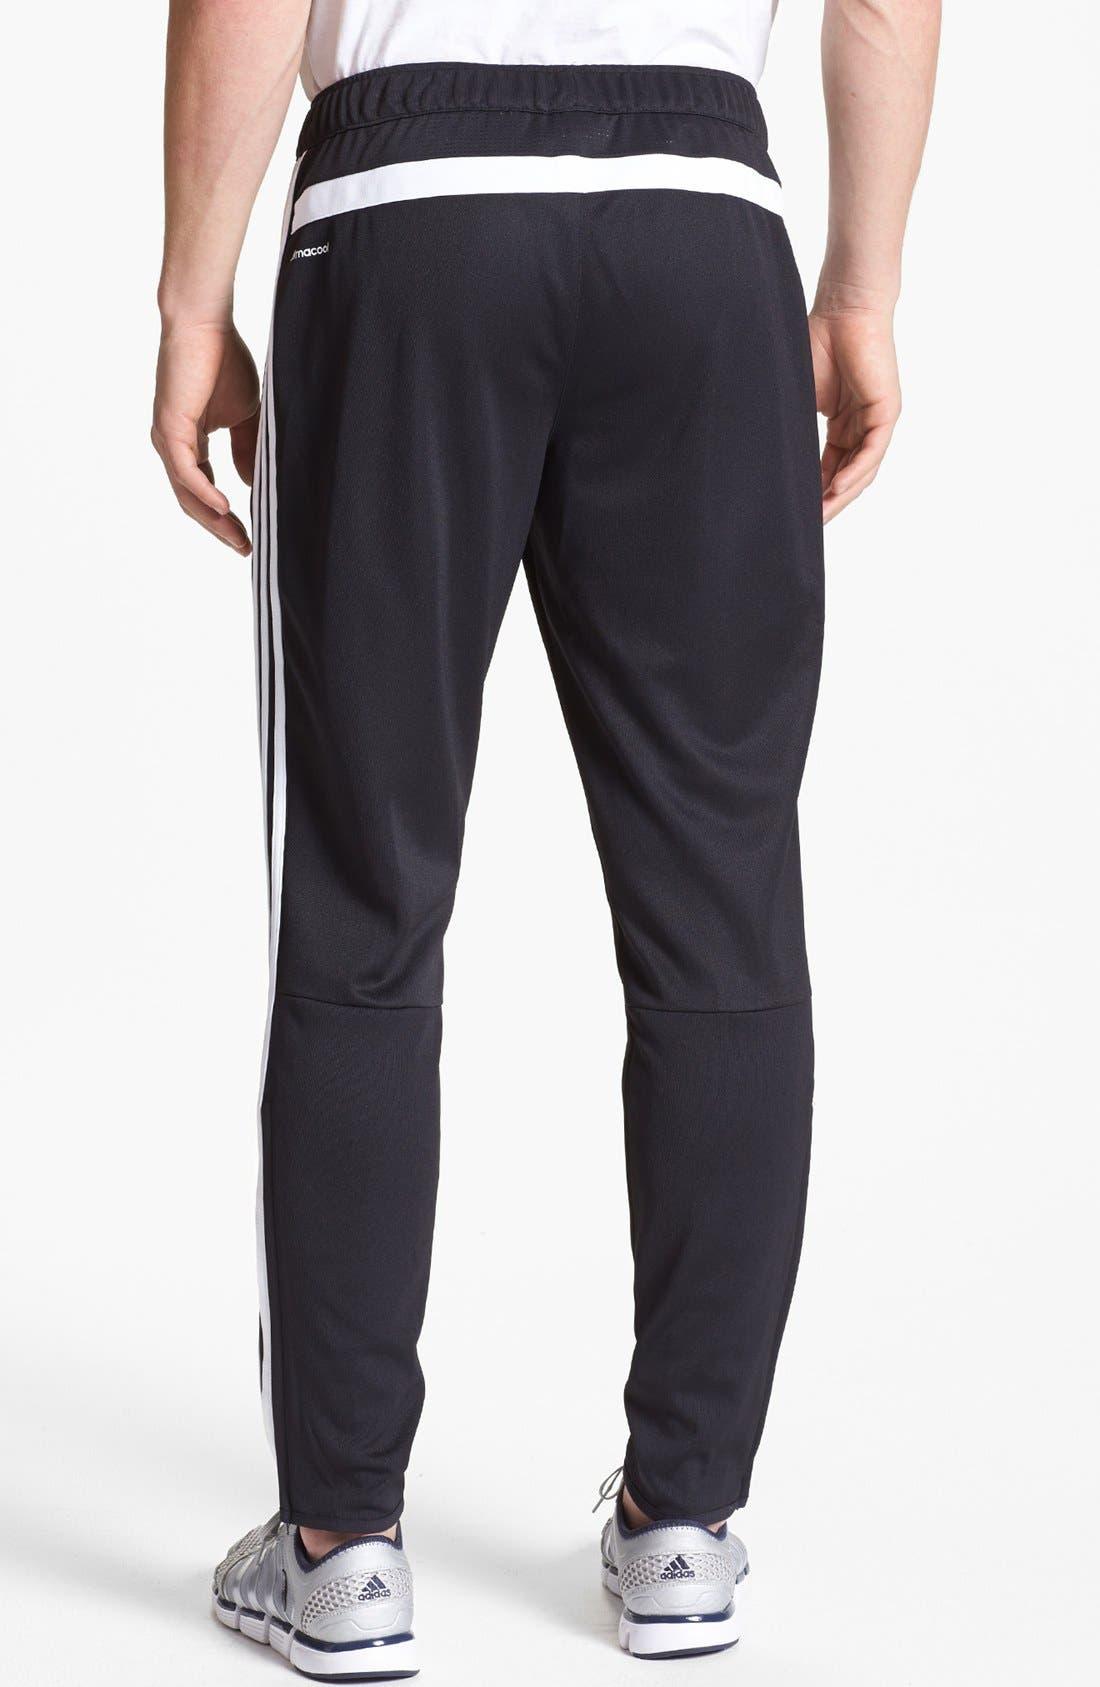 ADIDAS,                             'Tiro 13' Slim Fit Training Pants,                             Alternate thumbnail 4, color,                             001